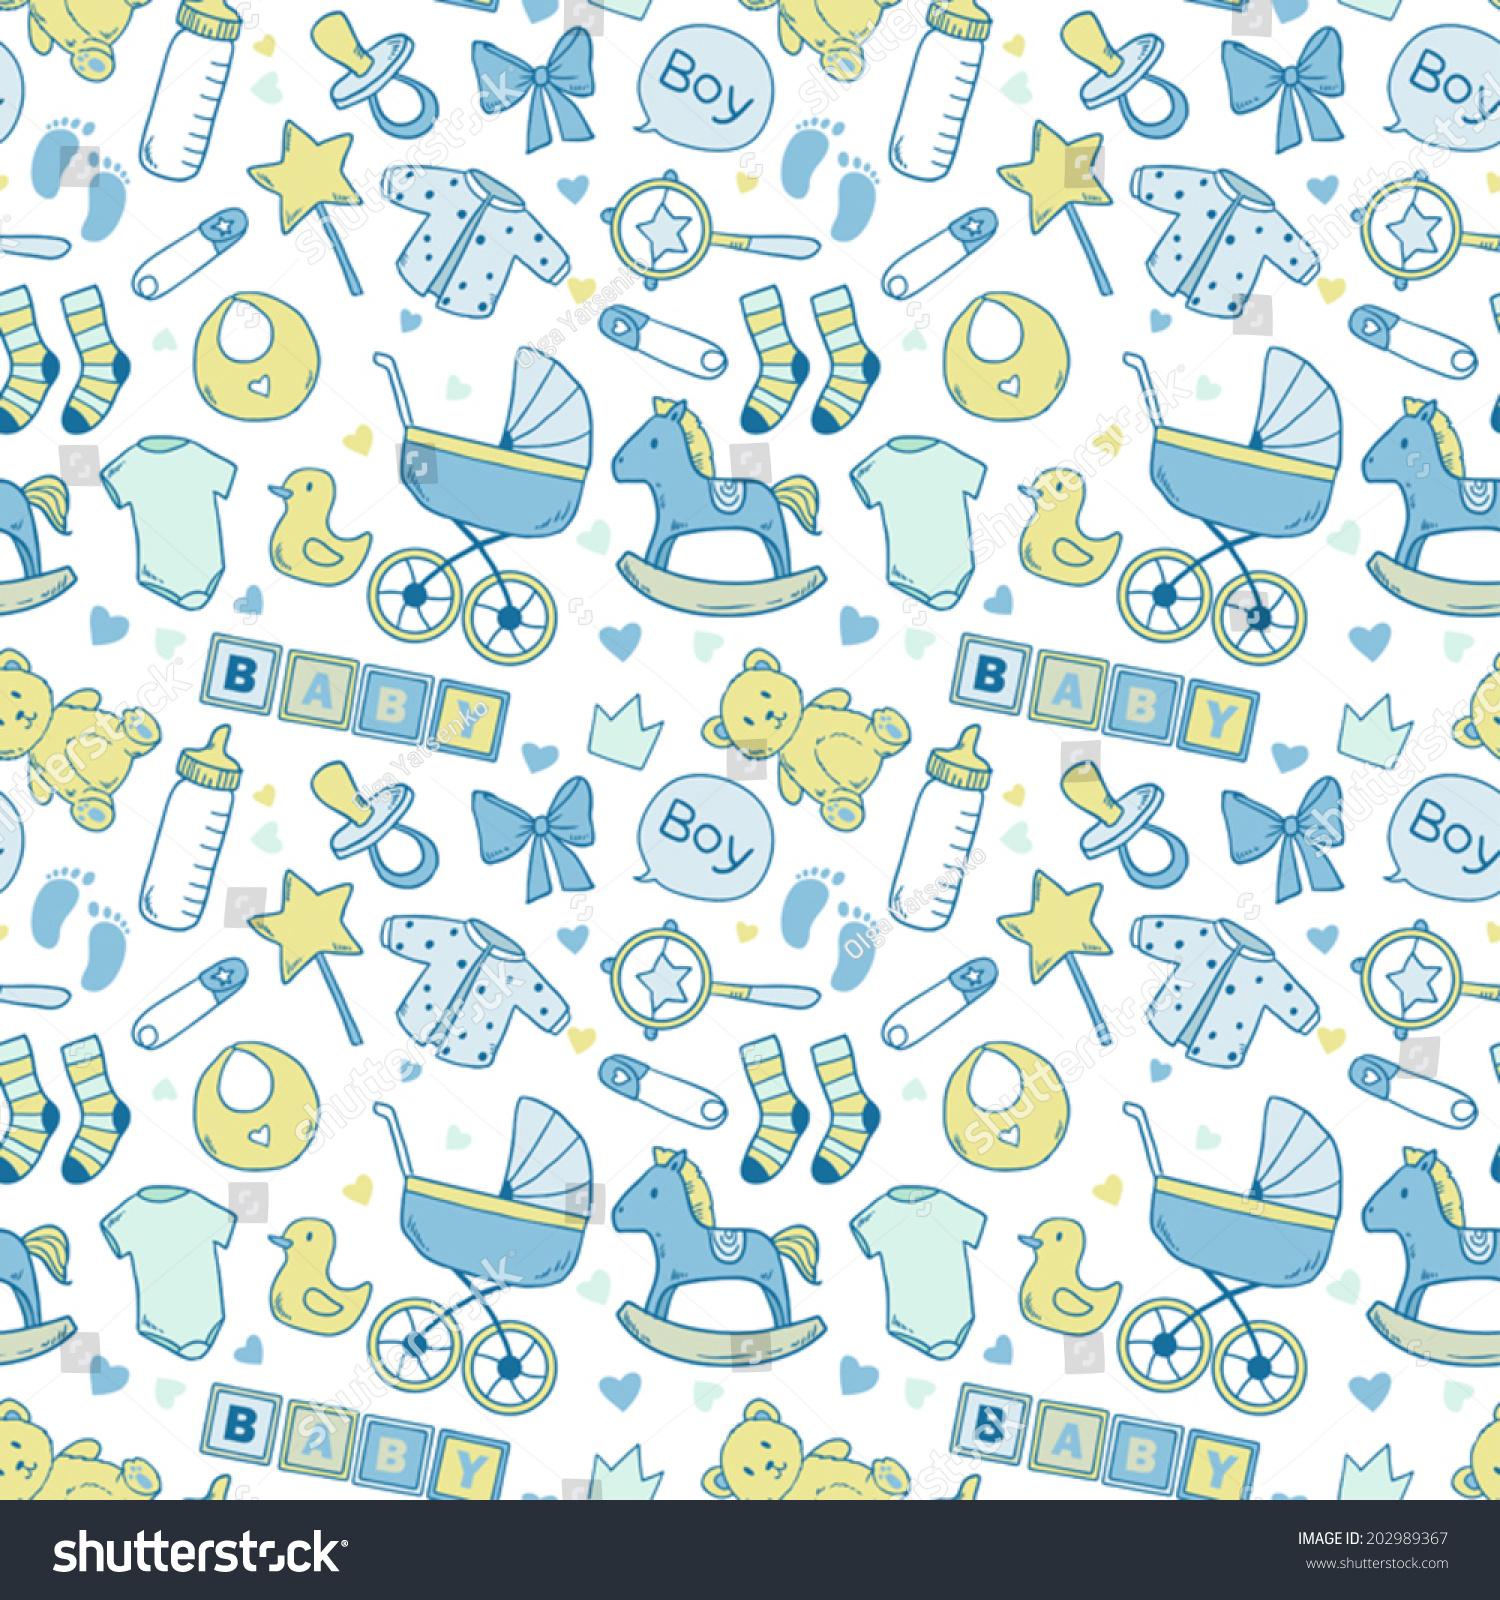 Baby Pattern Interesting Design Inspiration